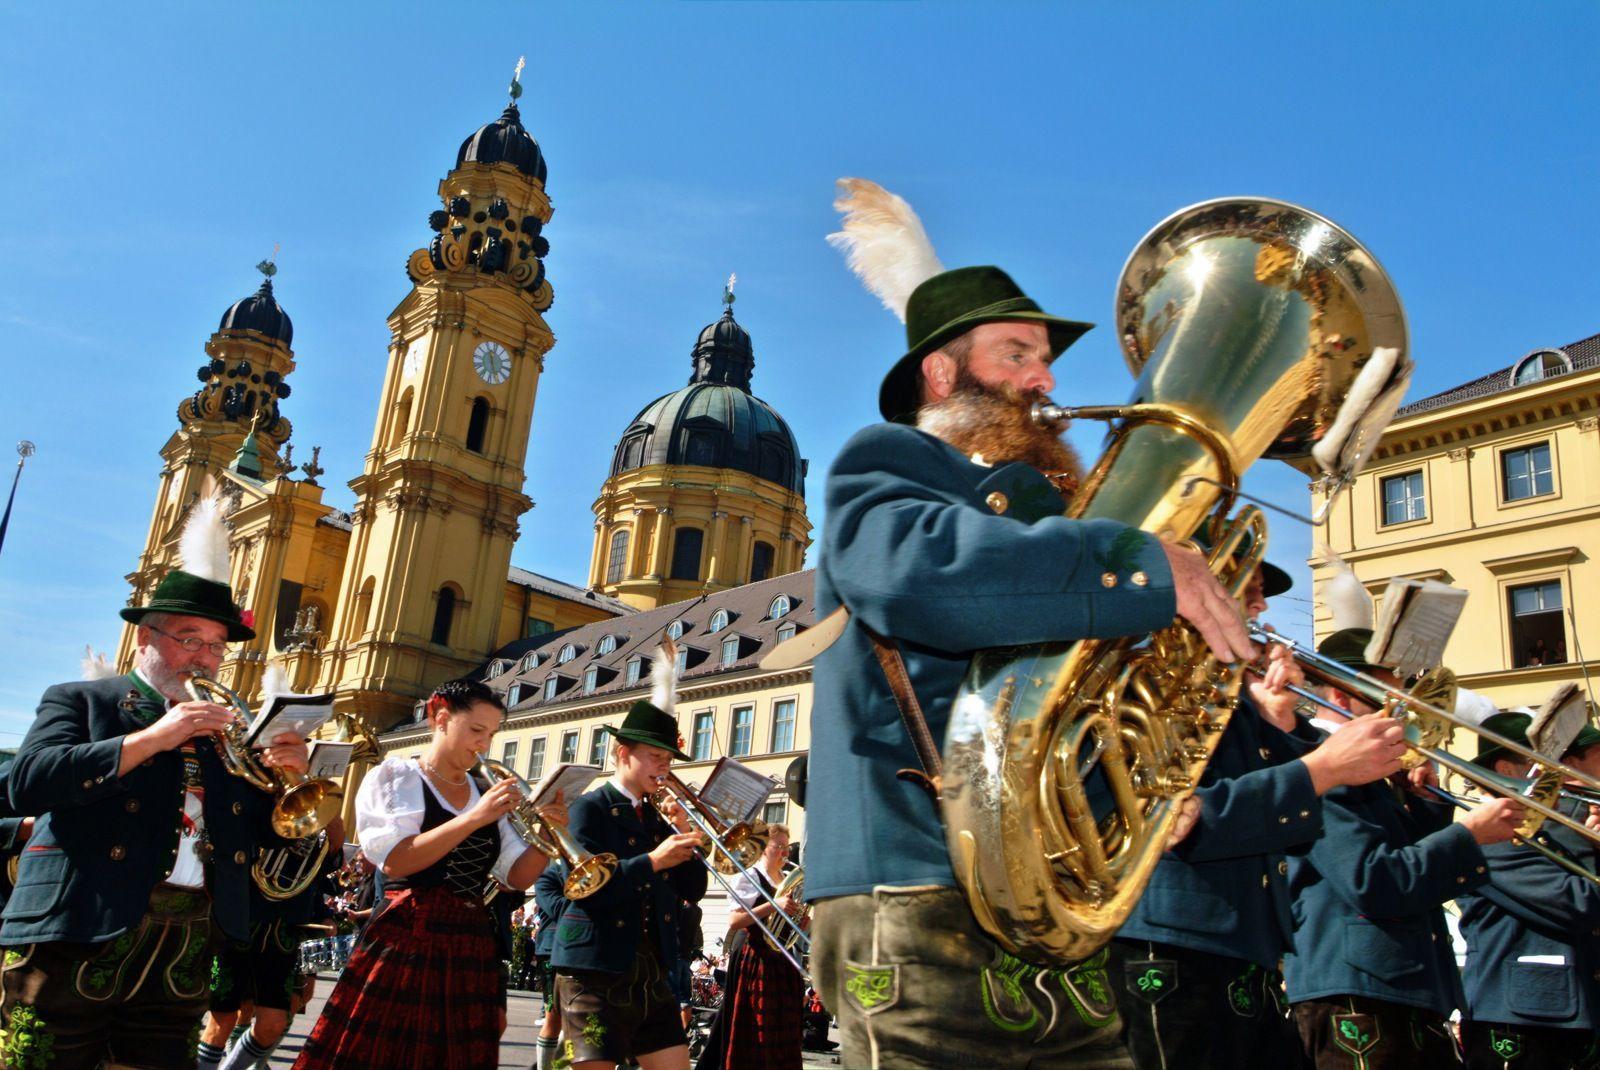 Oktoberfest | Sky HD Wallpaper